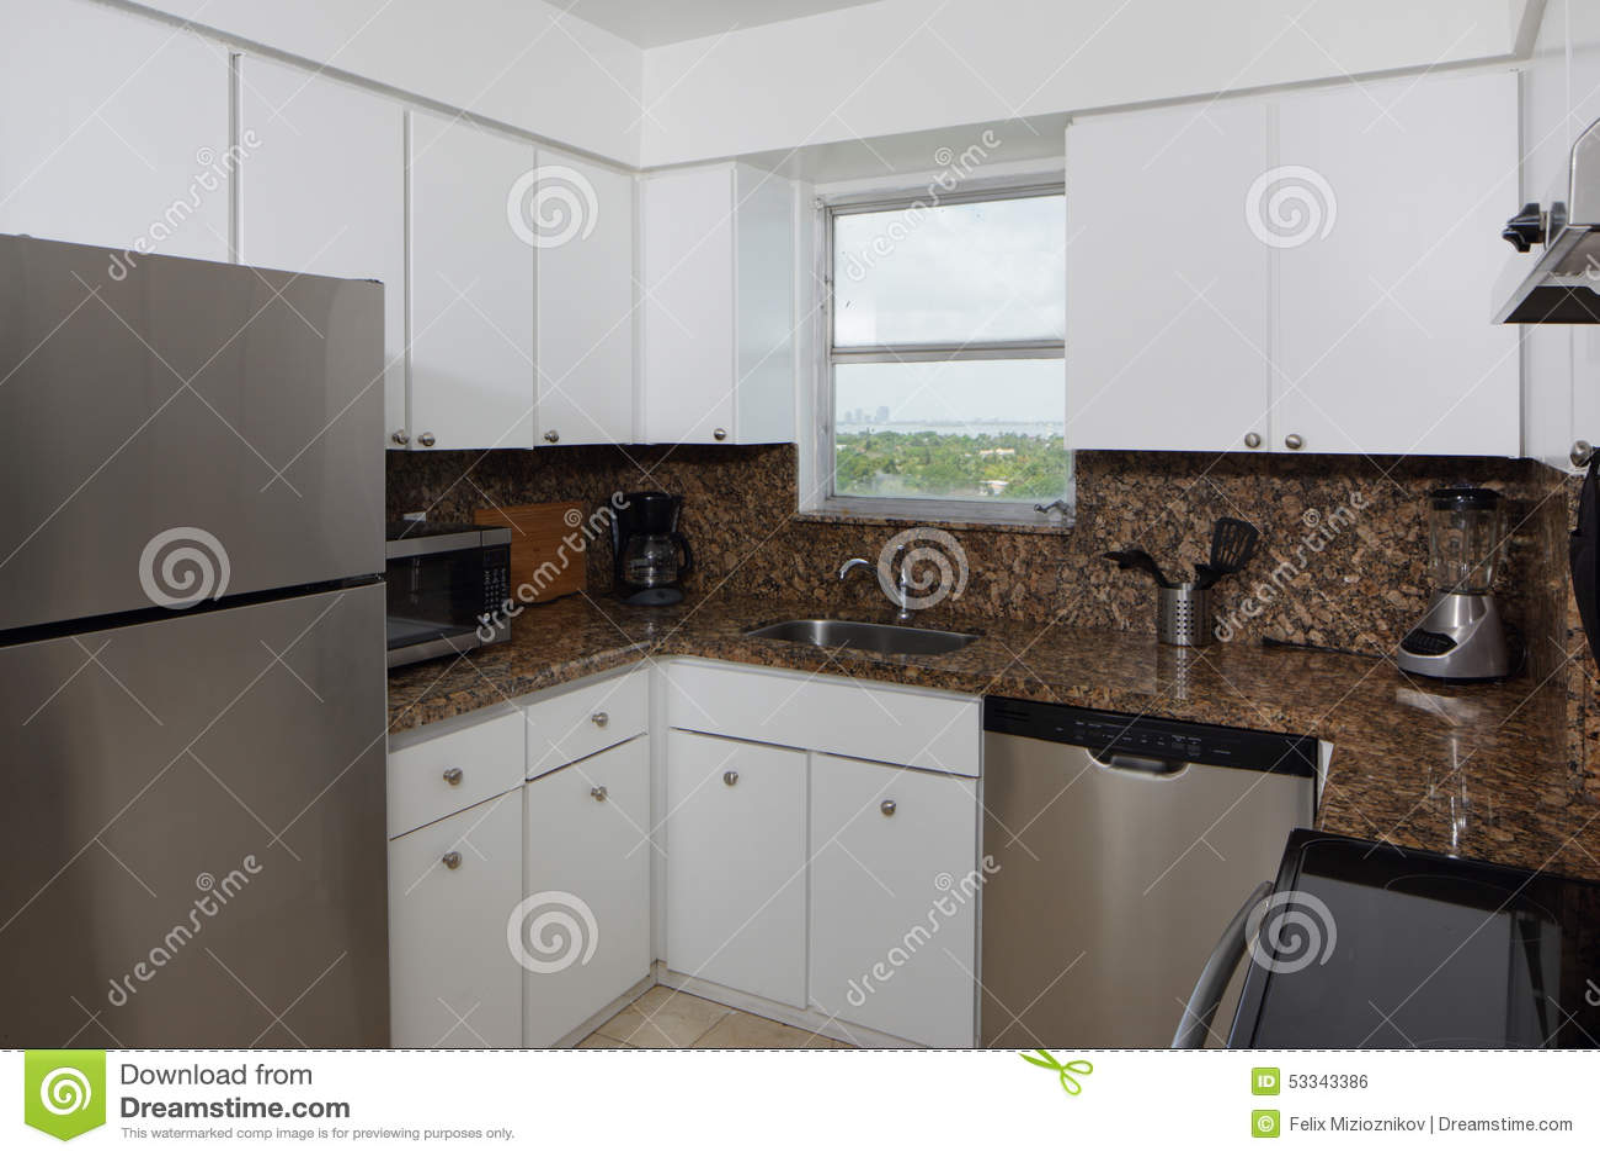 Keuken Moderne Klein : Moderne kleine keuken stock foto afbeelding bestaande uit